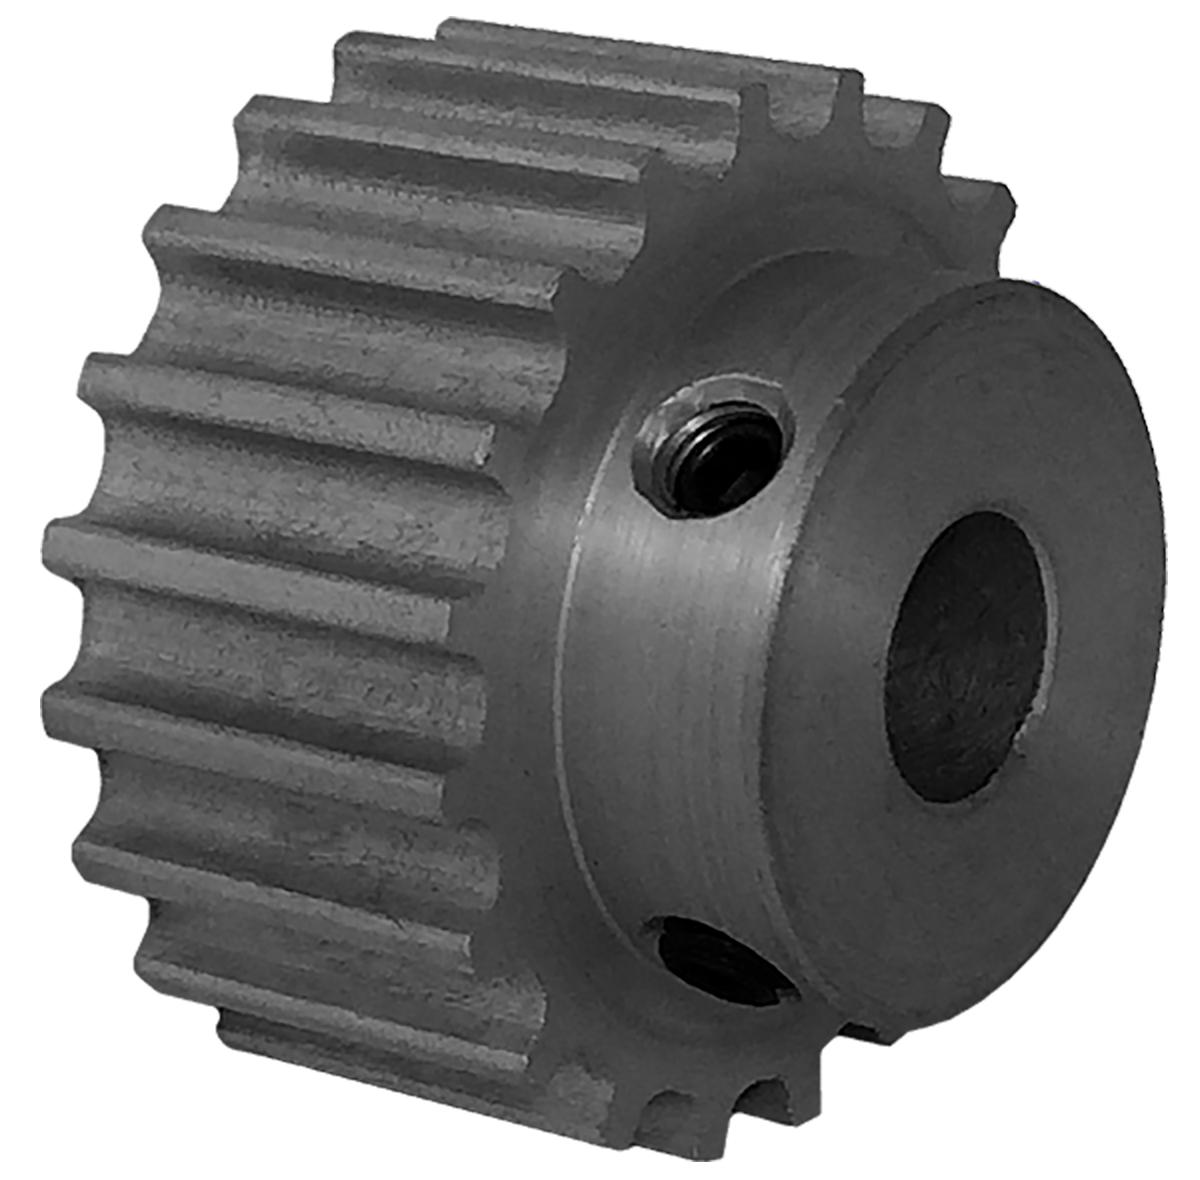 20-5M09M6A8 - Aluminum Powerhouse®HTD® Pulleys